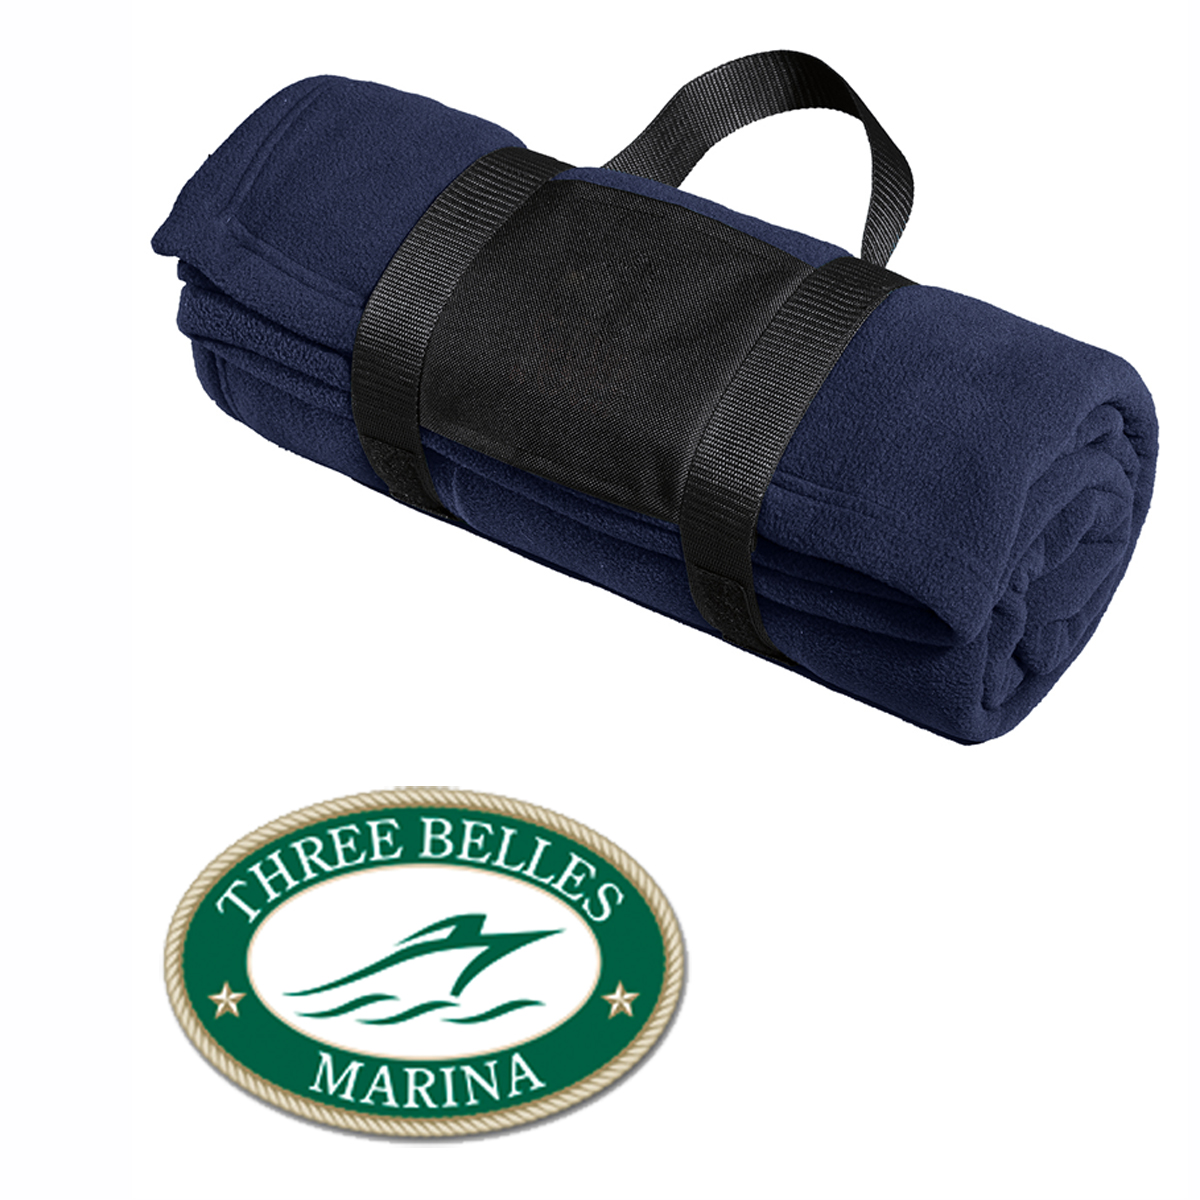 Three Belles Marina - Fleece Blanket (TBM702)